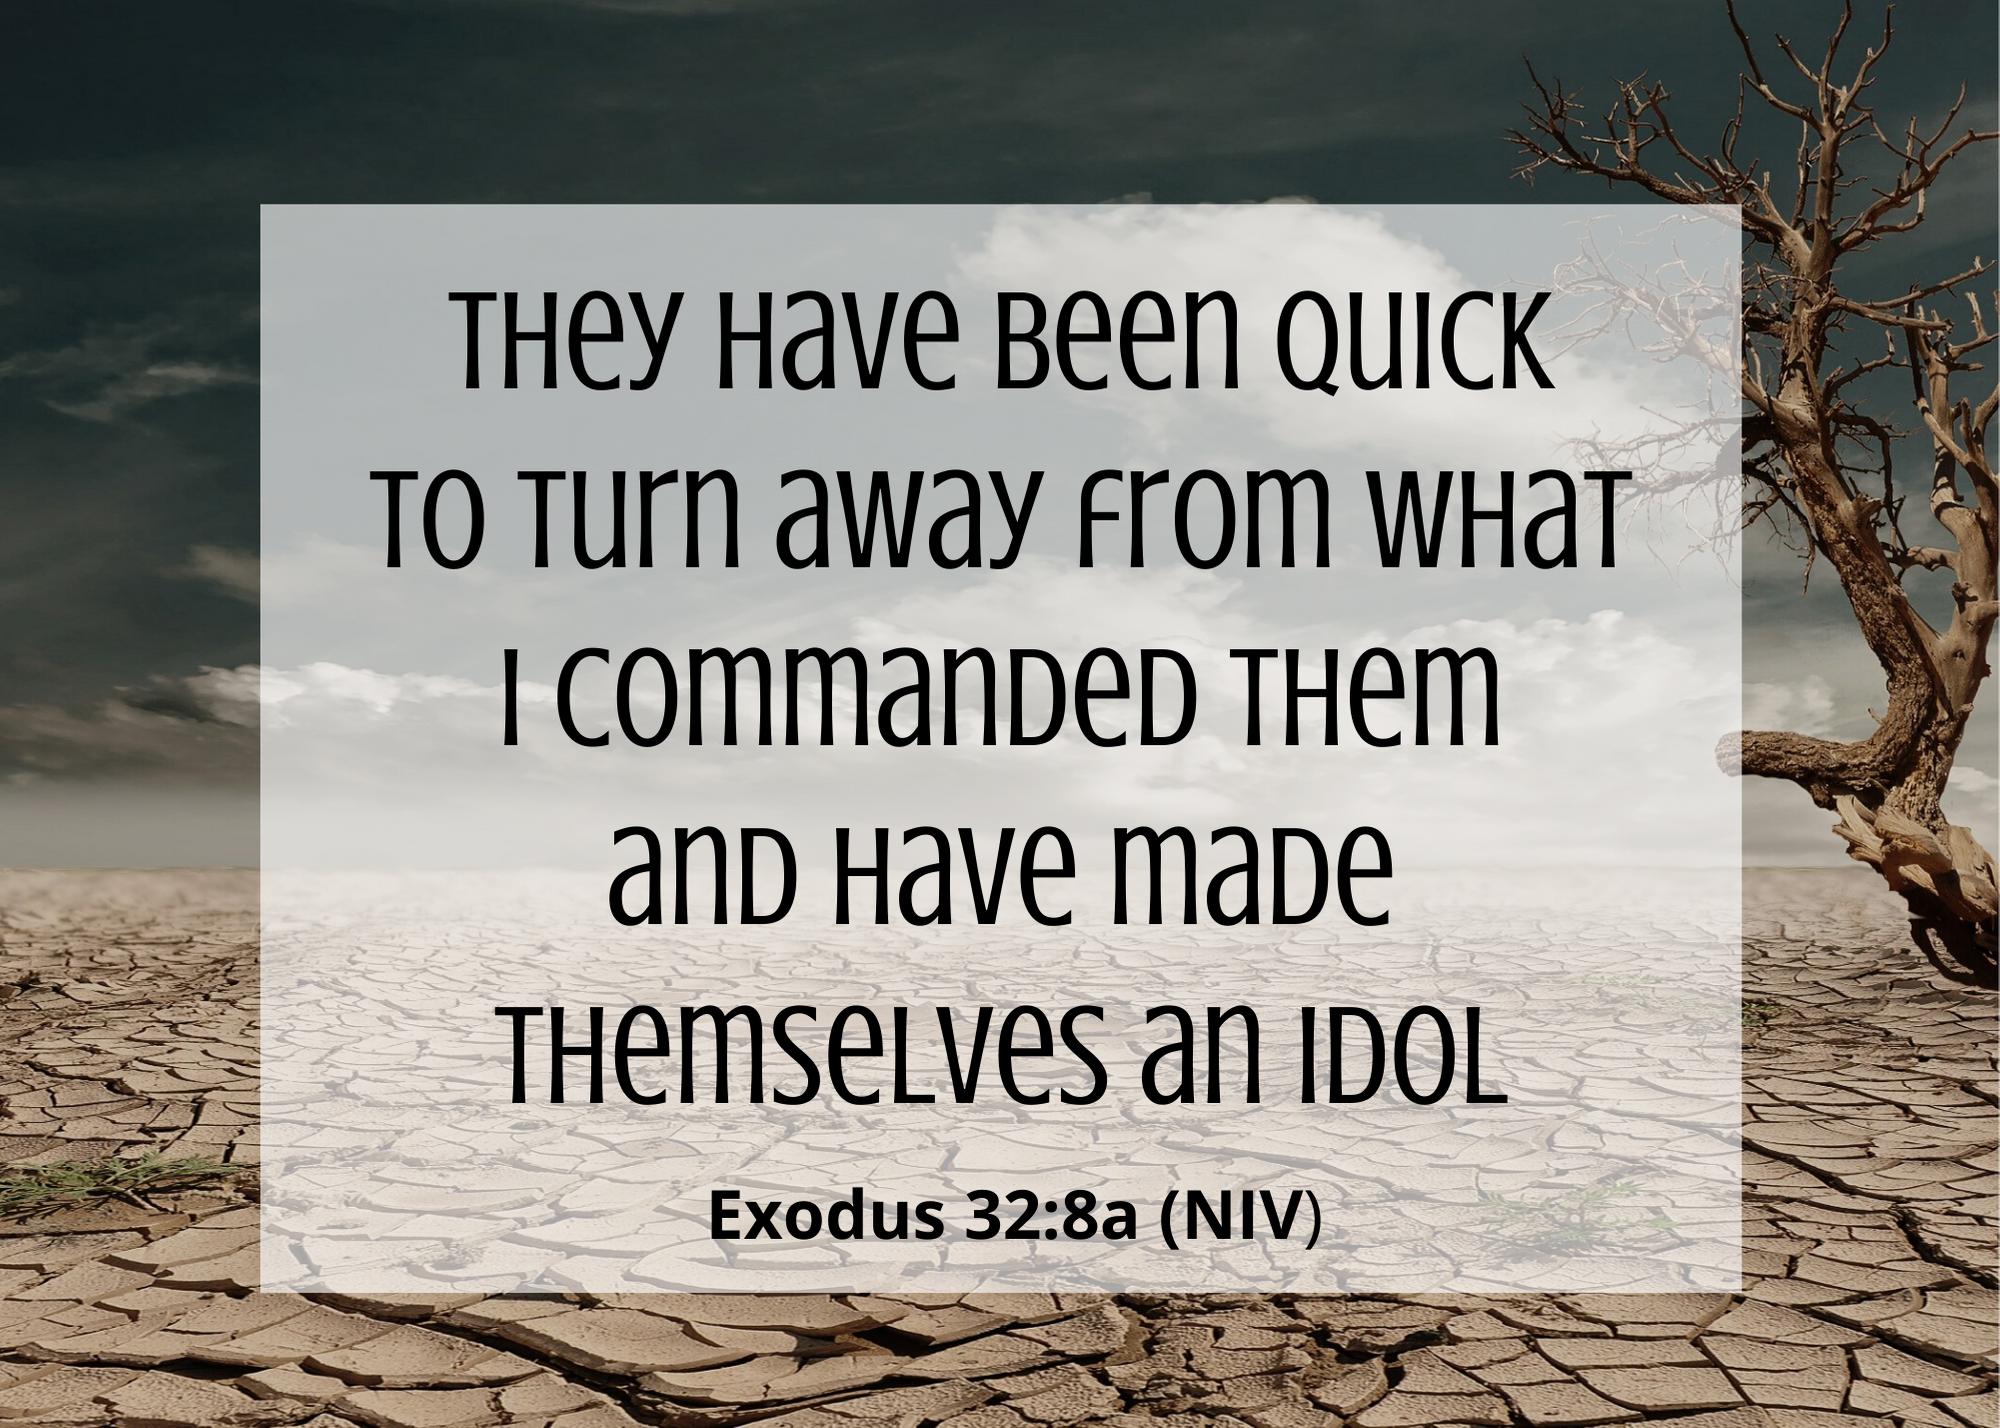 Exodus 32 8 a NIV